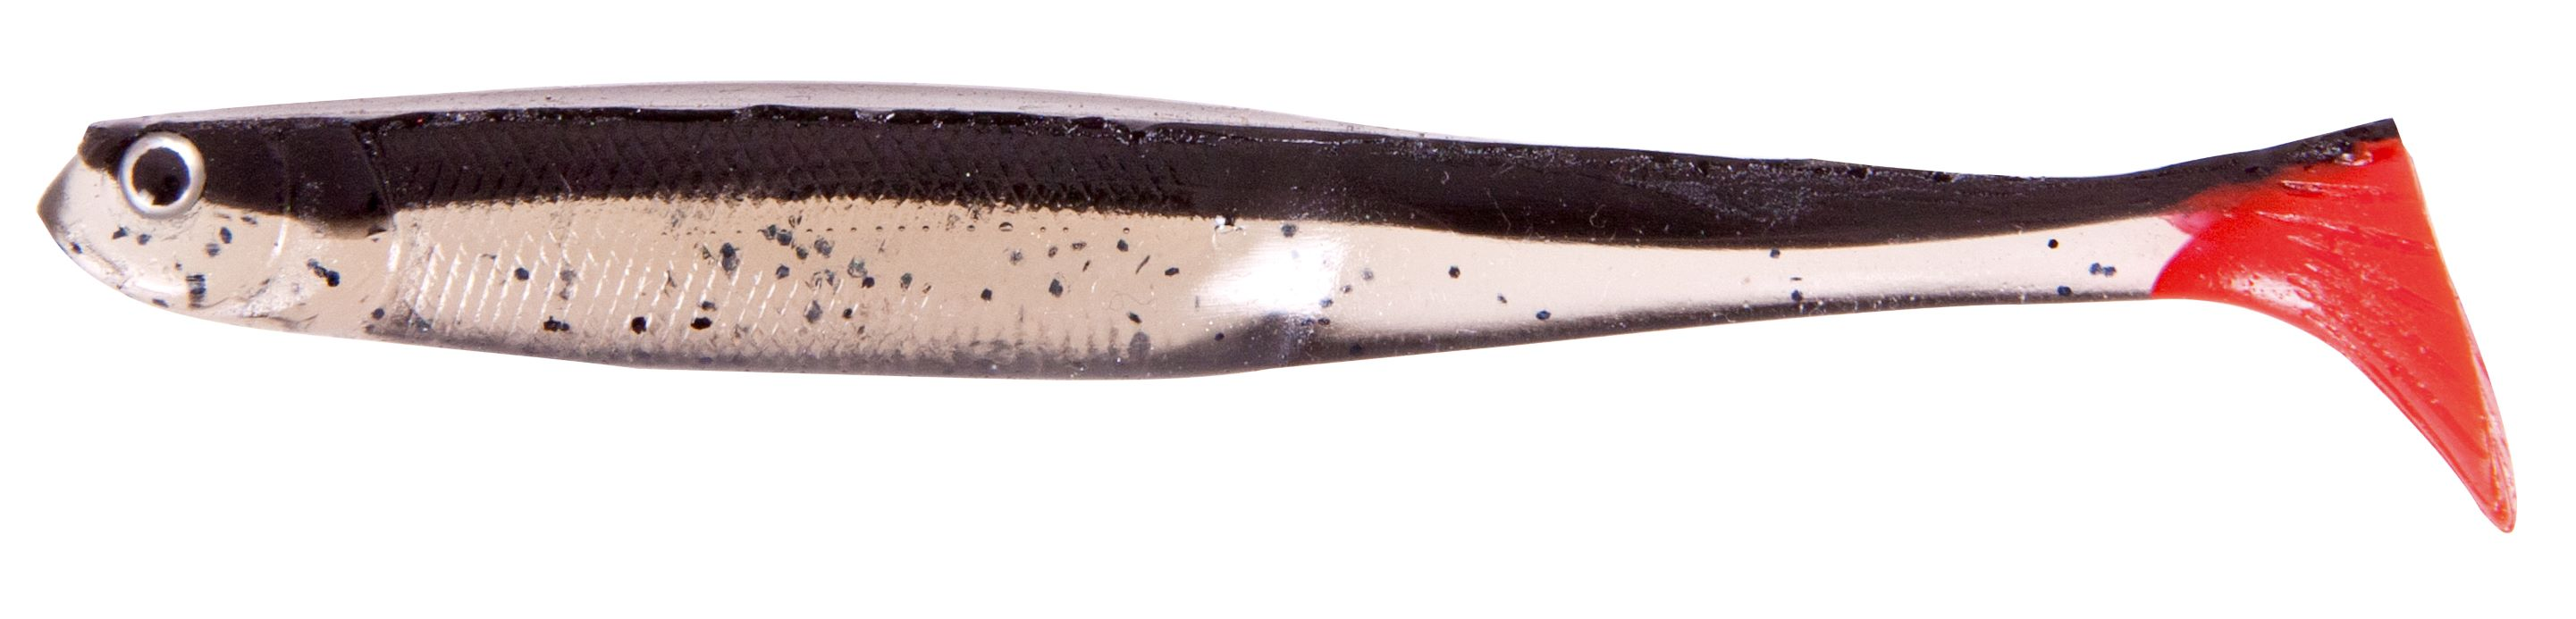 Iron Claw gumová nástraha Slim Jim 16 cm Vzor CB, 3ks